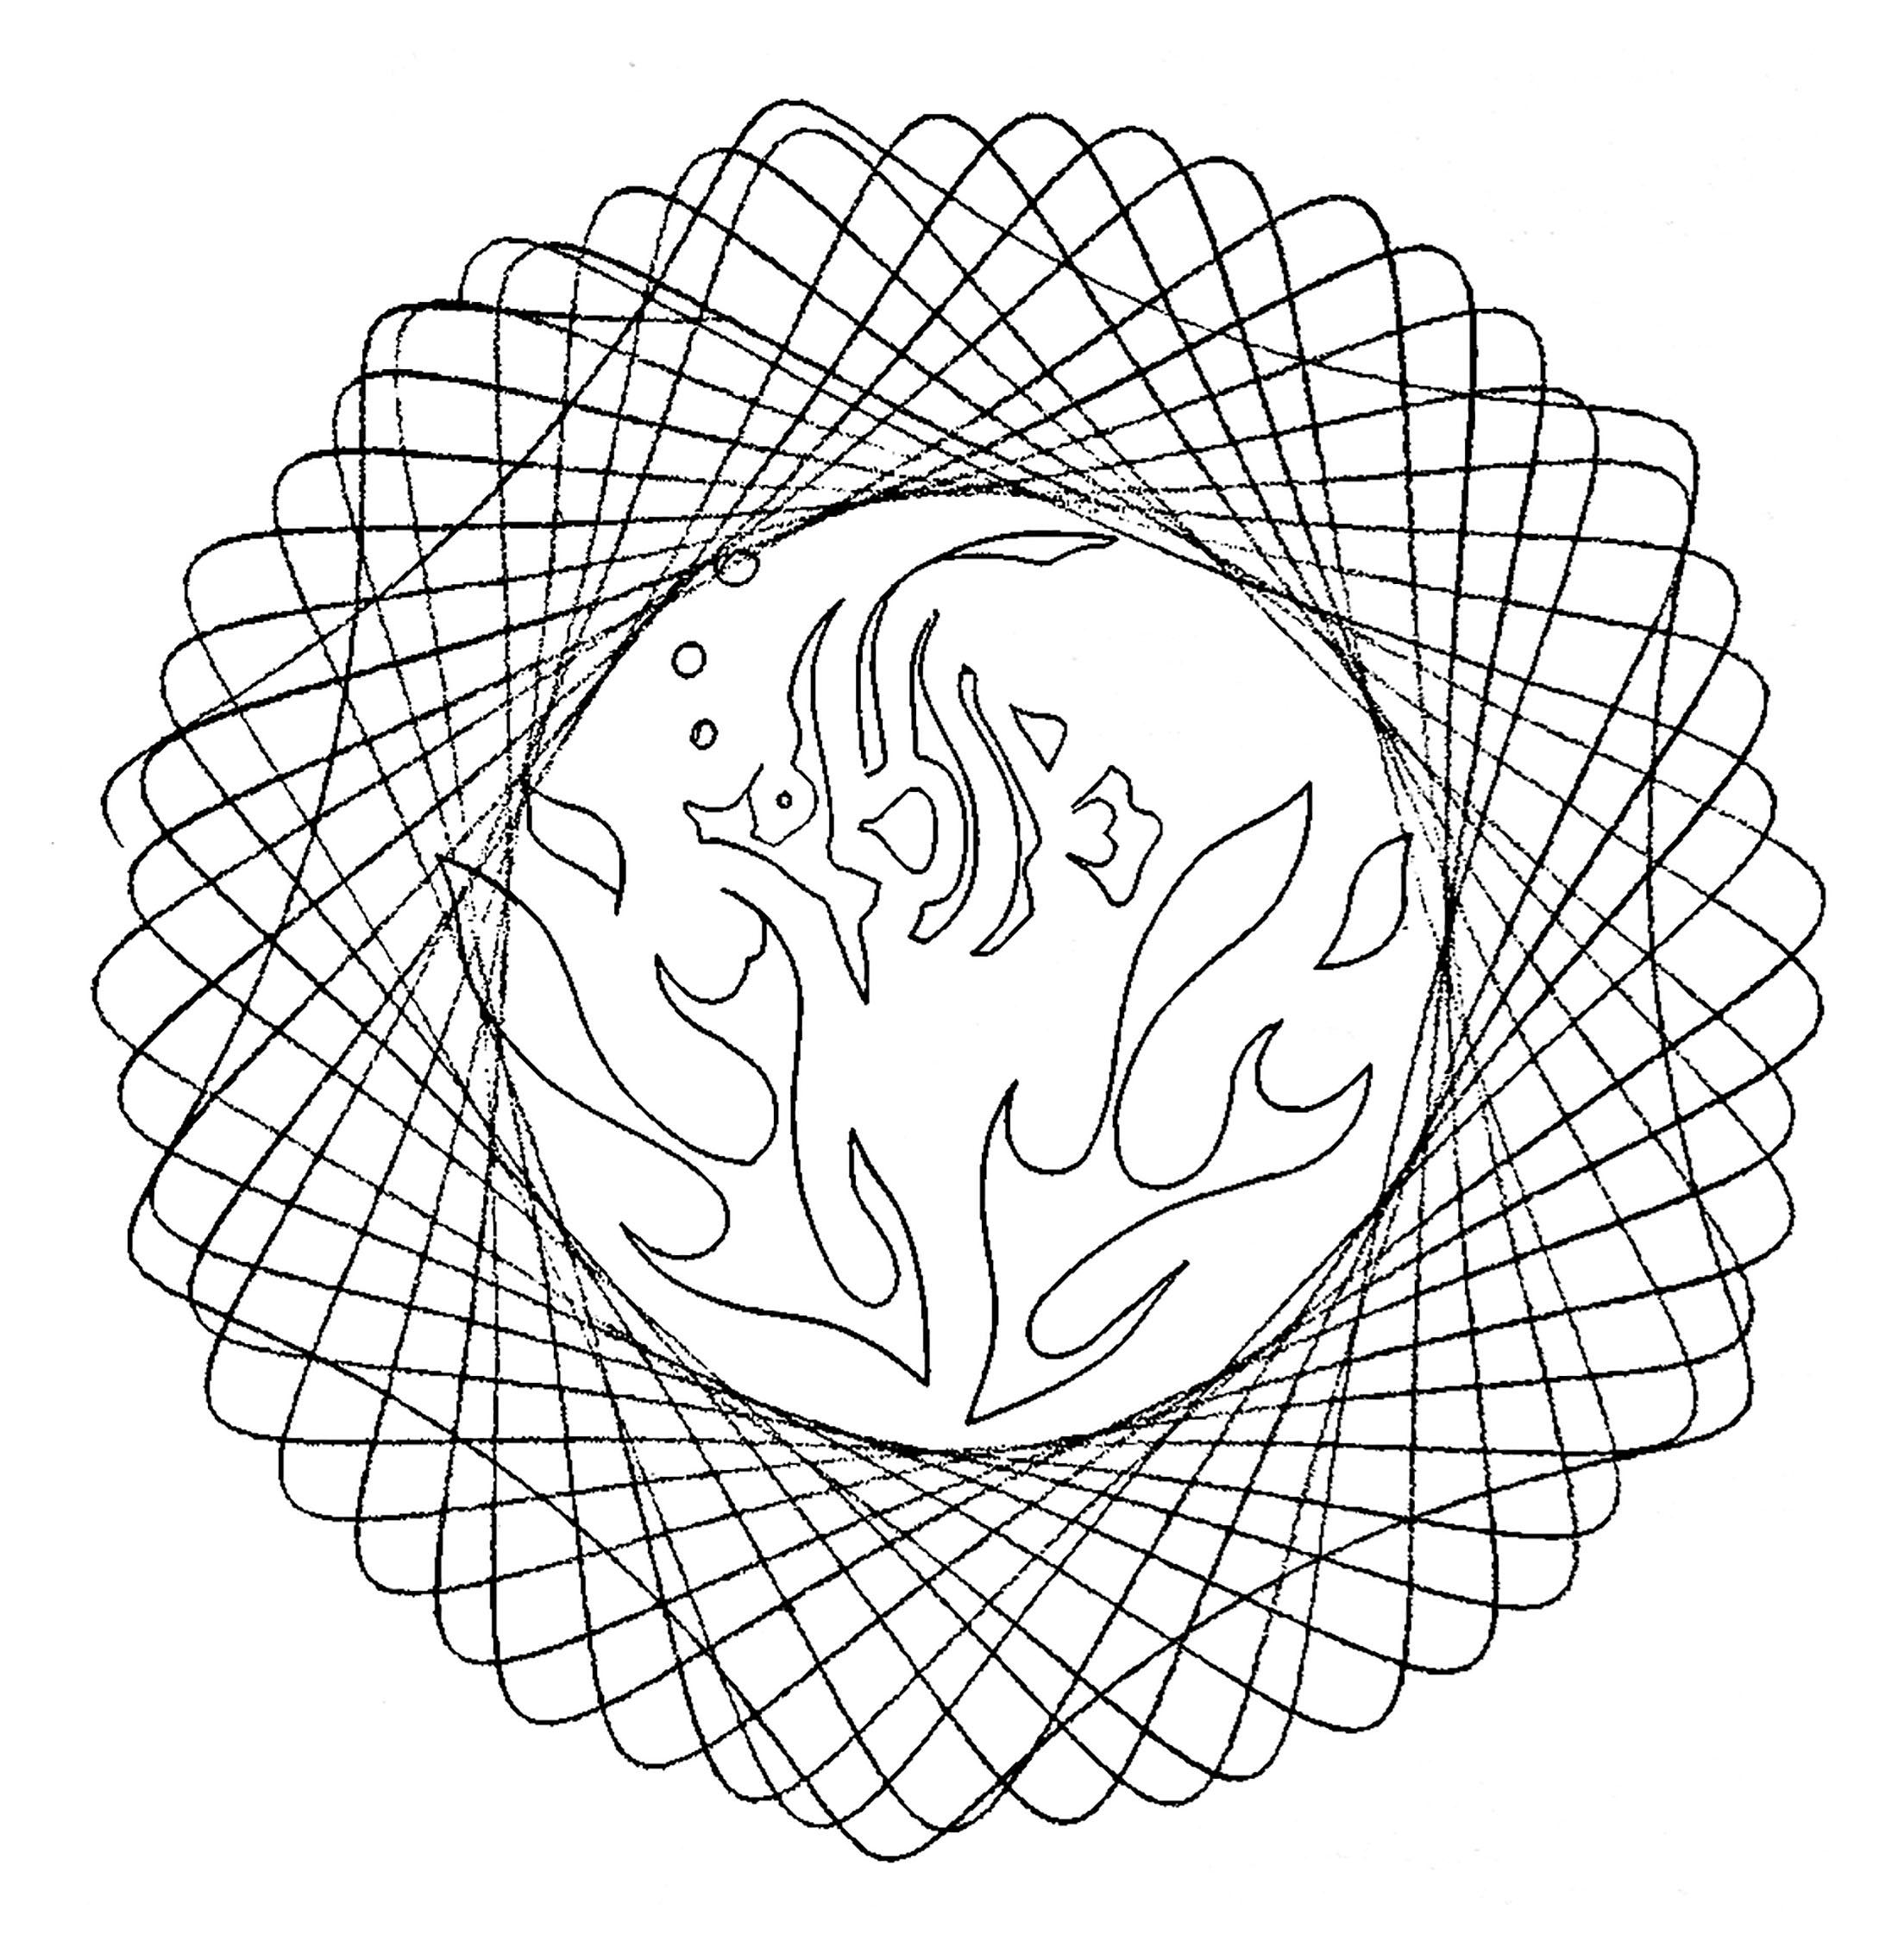 Abstract Mandala to discover